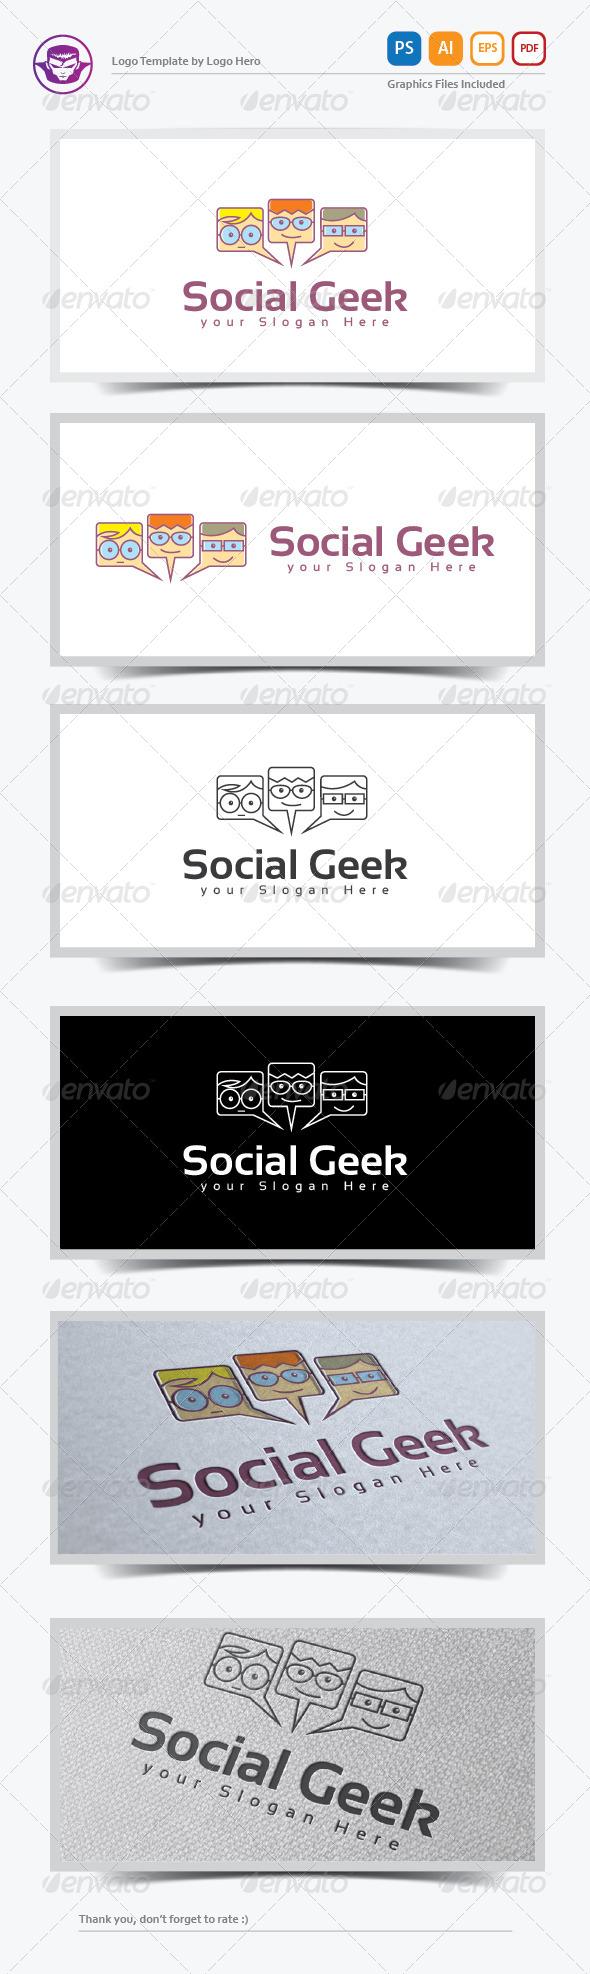 GraphicRiver Social Geek Logo Template 8234317